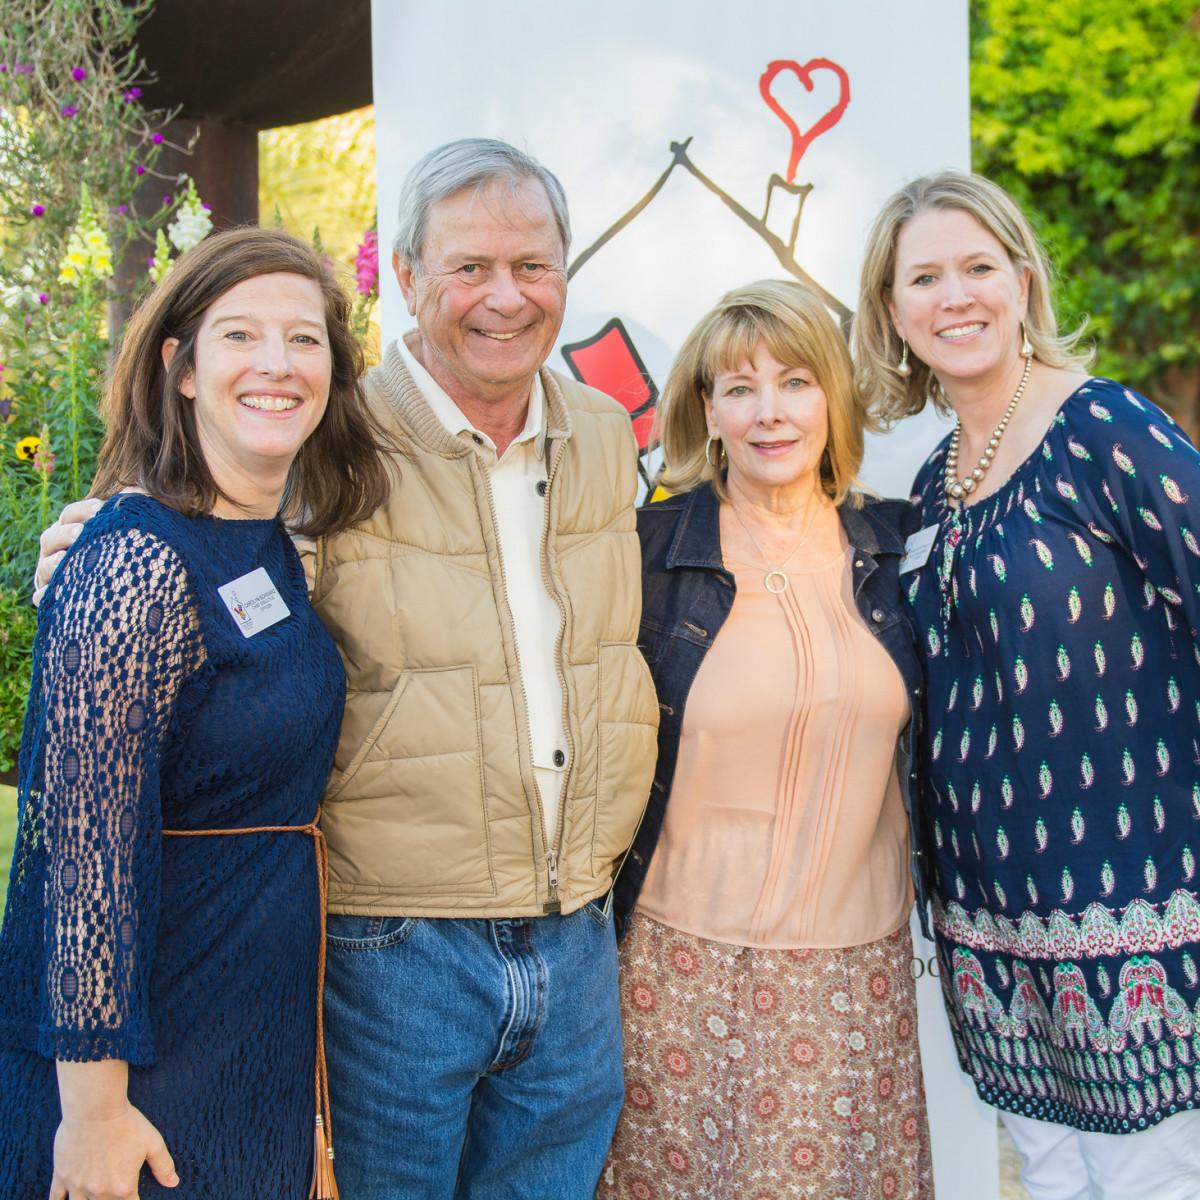 Bandana Ball April 2016 Ronald McDonald House Charities of Central Texas Carolyn Schwarz Denny Meyer Joanne Meyer Missy Strittmatter